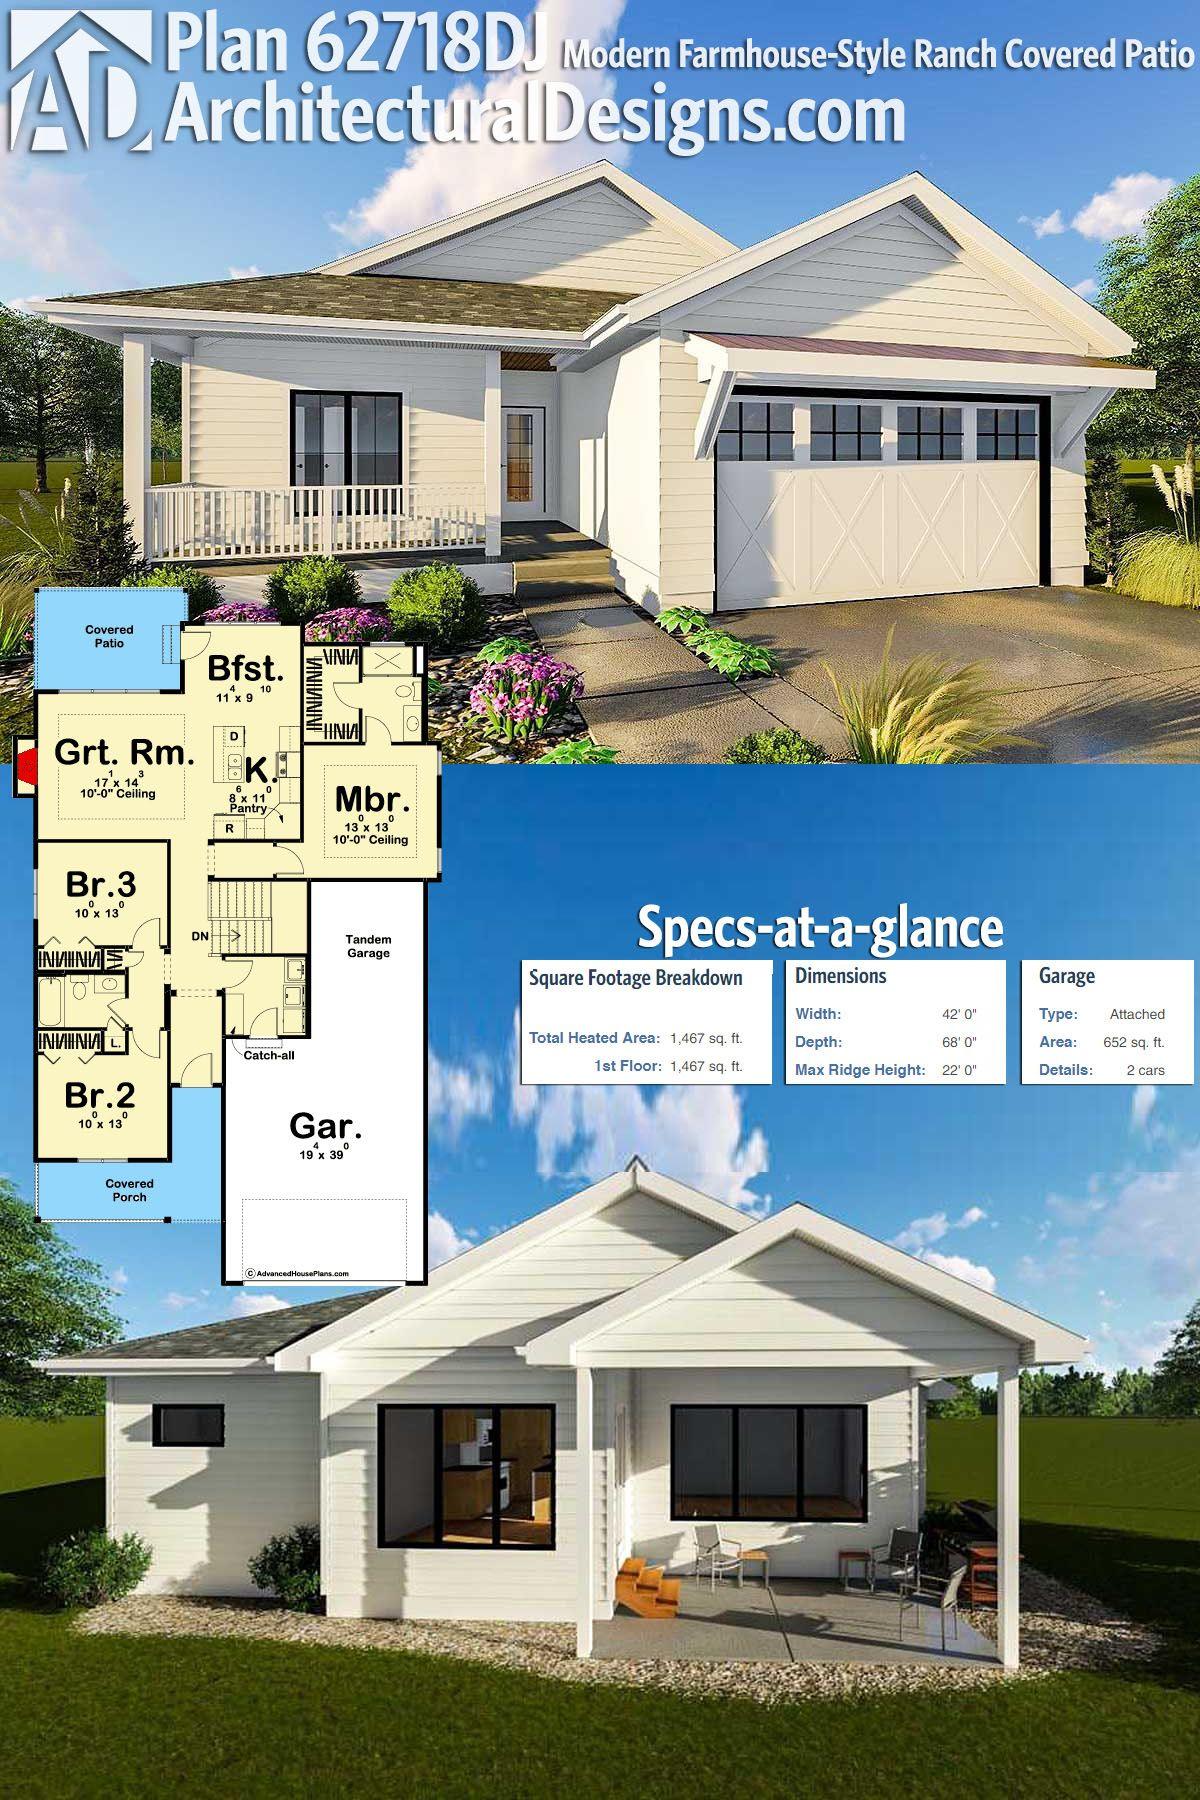 Plan 62718DJ Modern Farmhouse Style Ranch Covered Patio